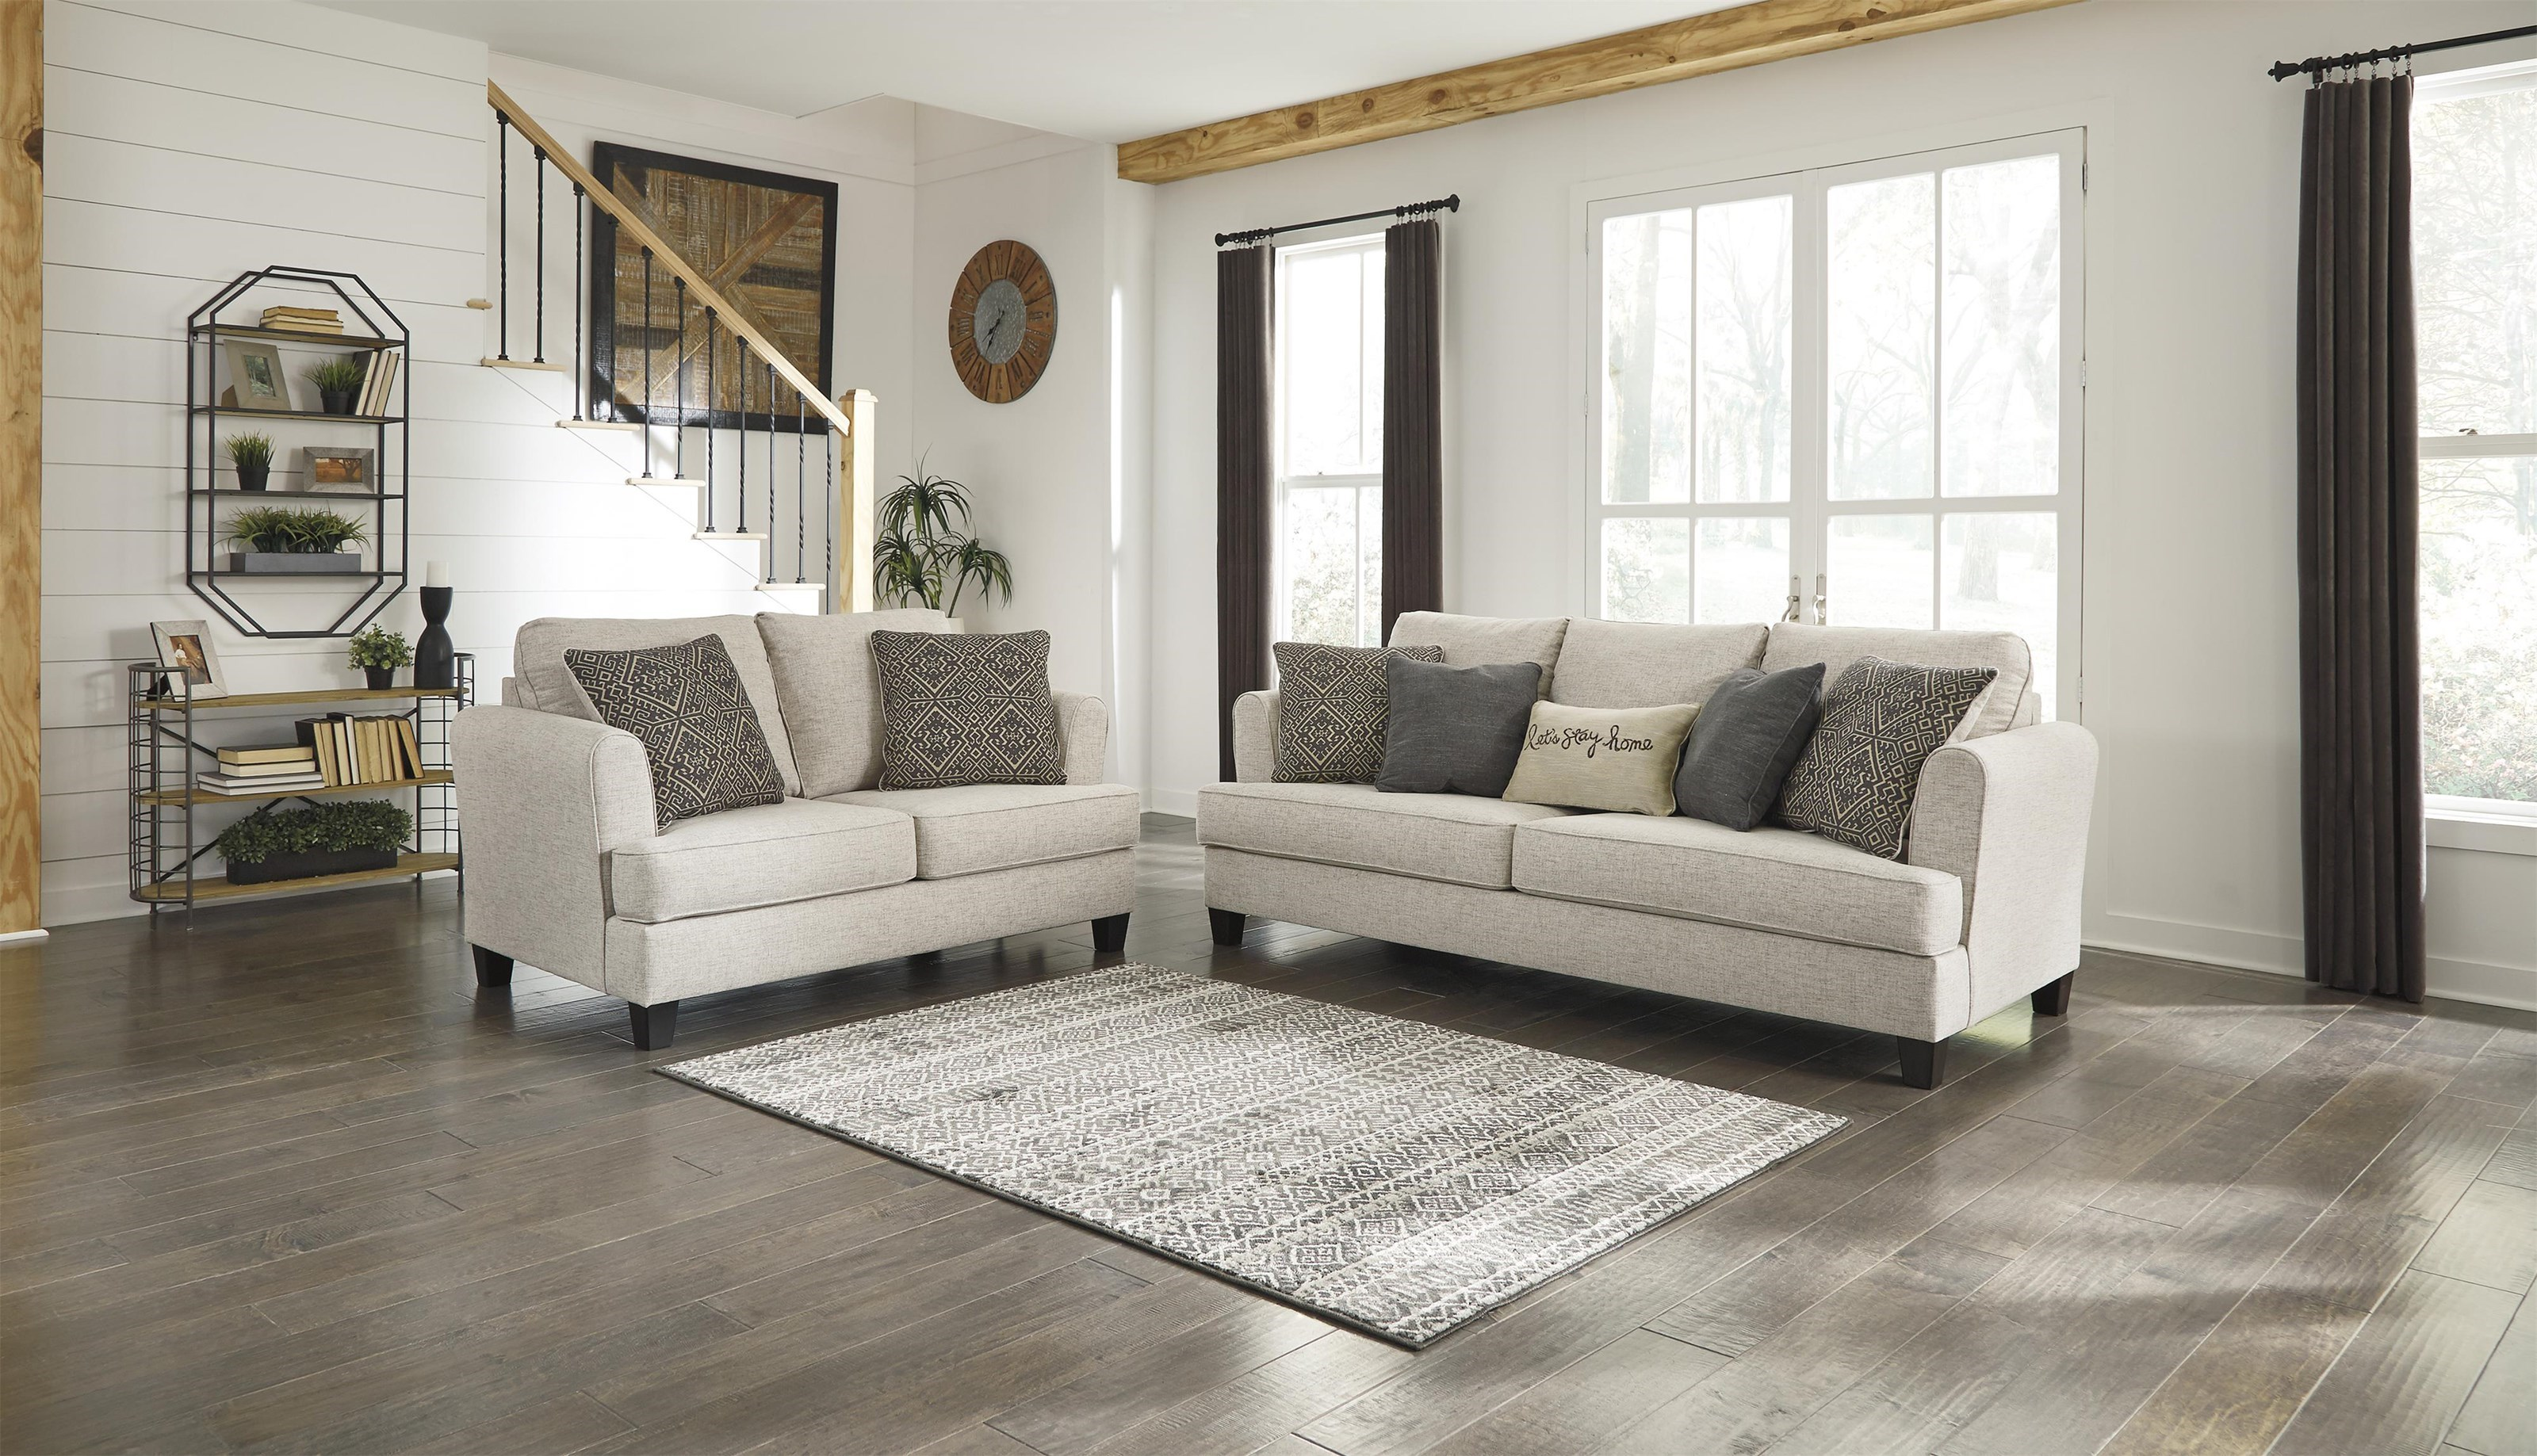 Ashley Furniture Alcona 9831038 35 Beige Sofa And Loveseat Set Sam Levitz Furniture Stationary Living Room Groups